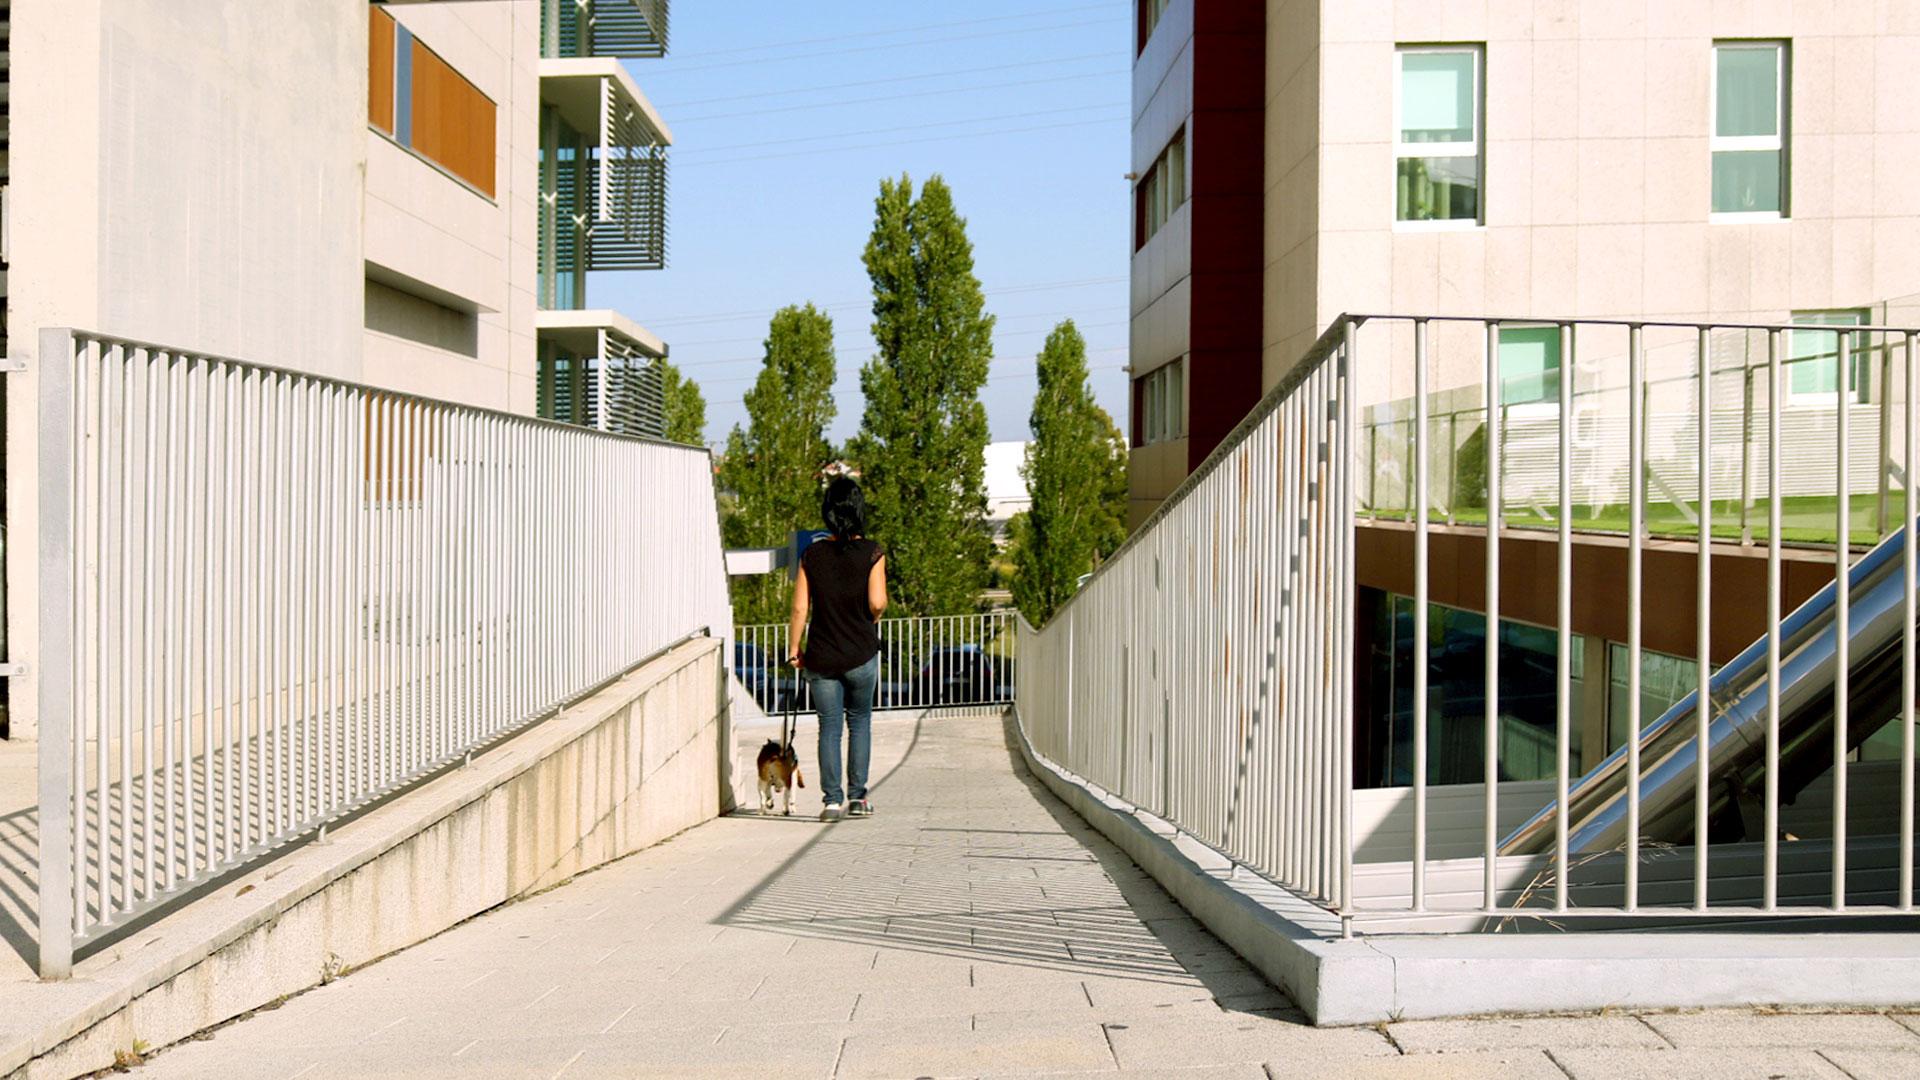 Forca-vouga-vera-cruz-Aveiro-ville-real-estate-imobiliaria-comprar-arrendar-vender-moradia-apartamento-casa-t0-t1-t2-t3-t4-1